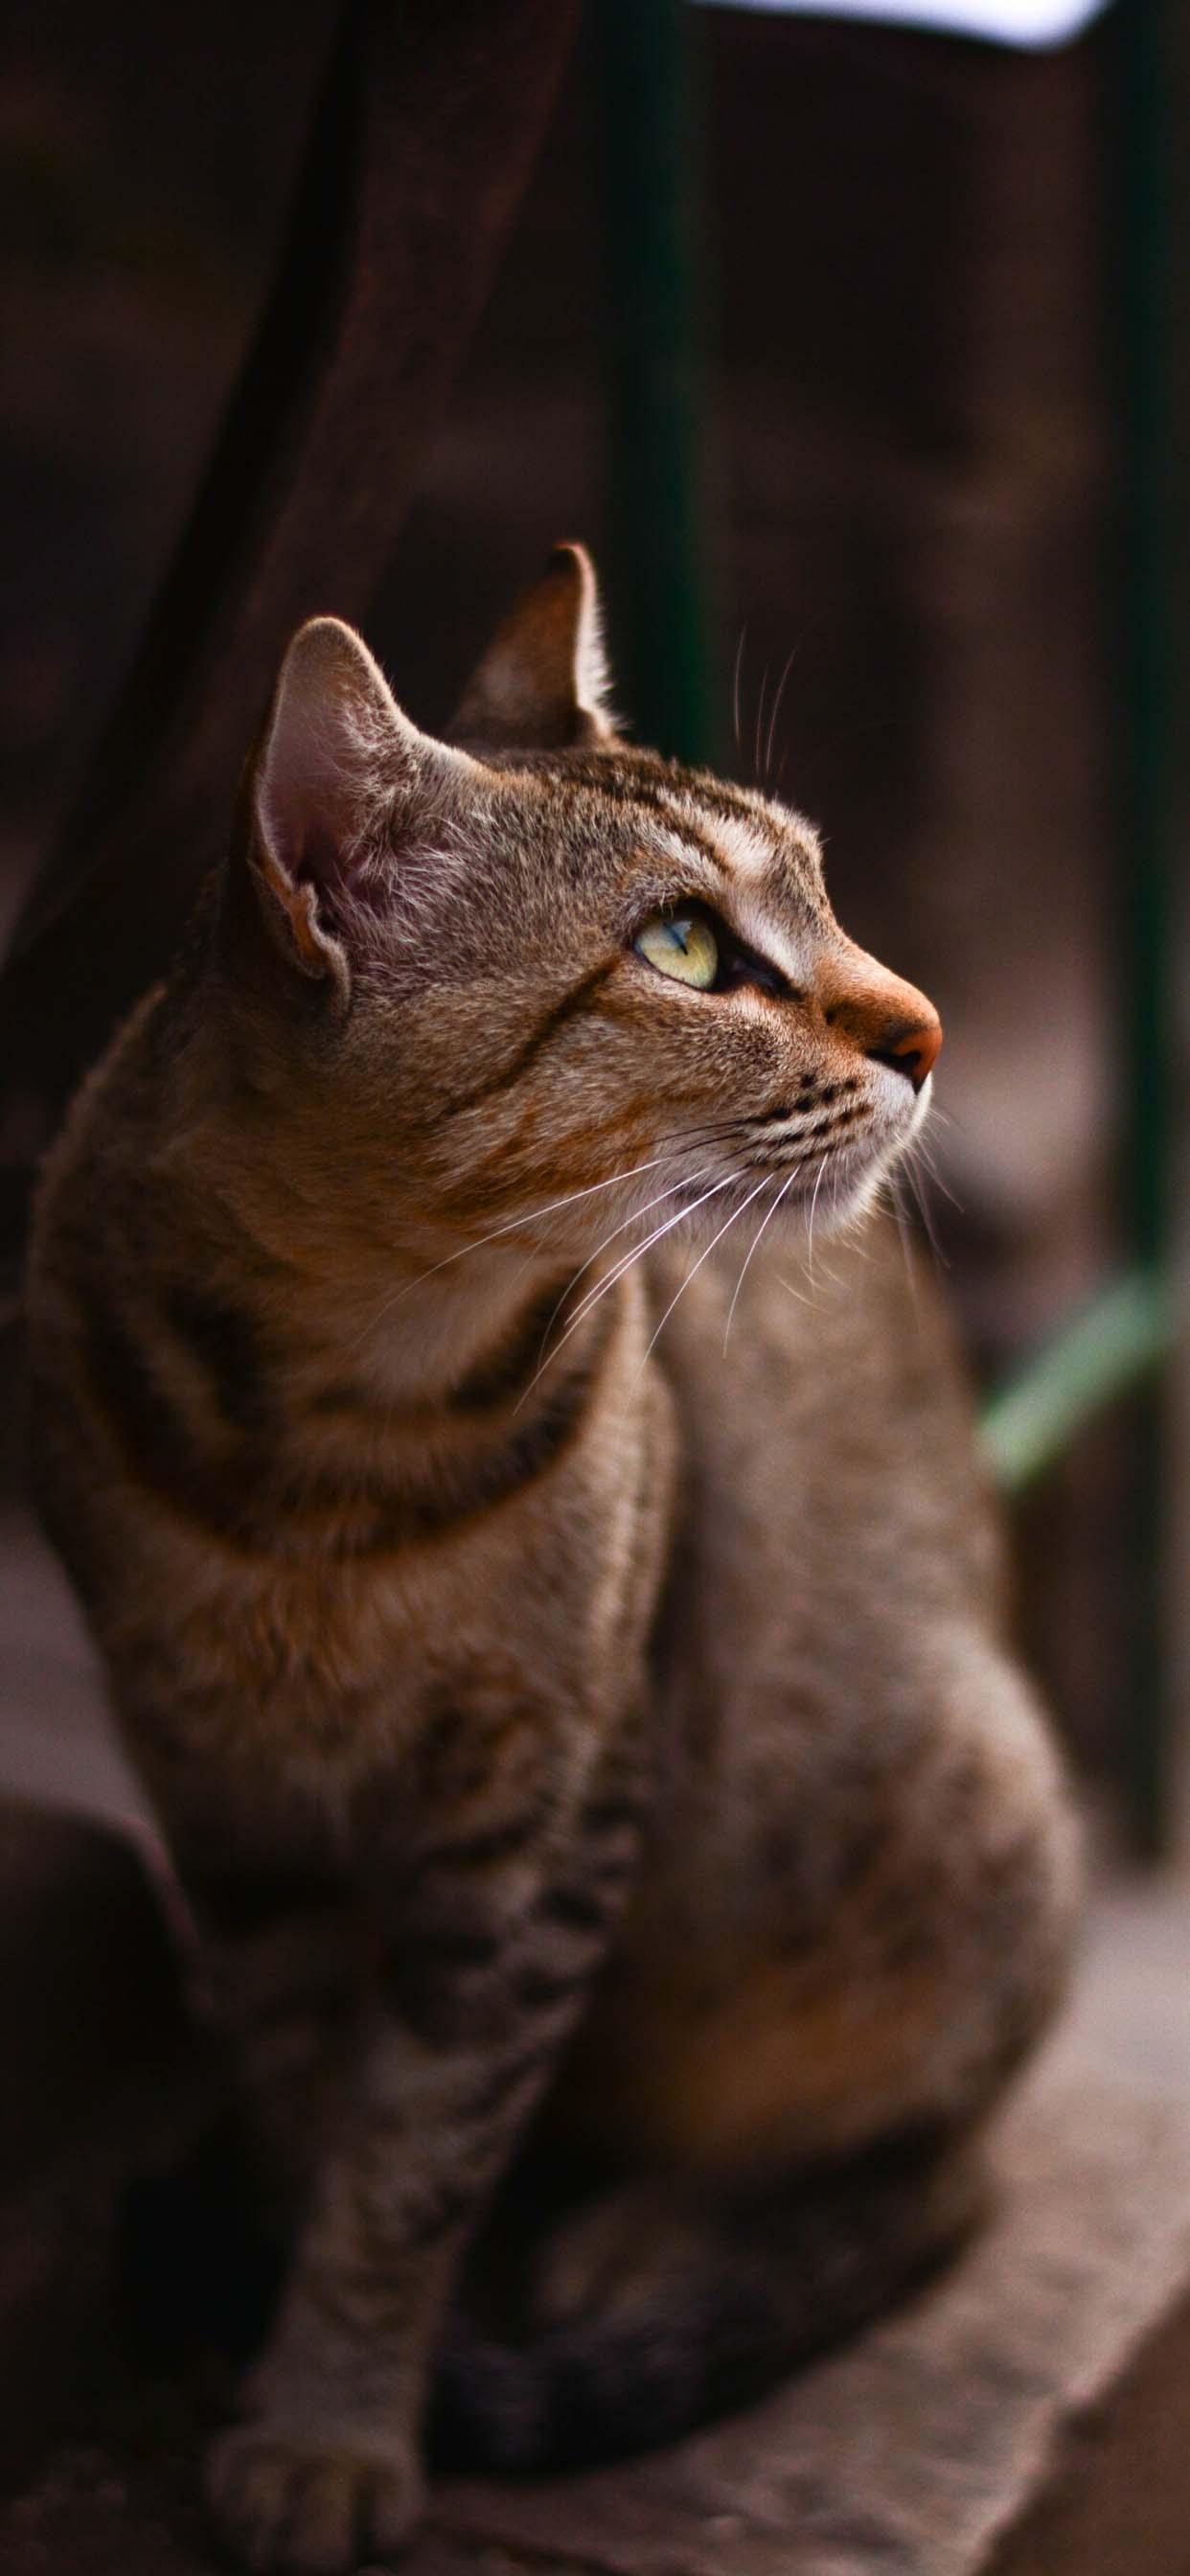 Stunning Beautiful Cat - iPhone Wallpaper